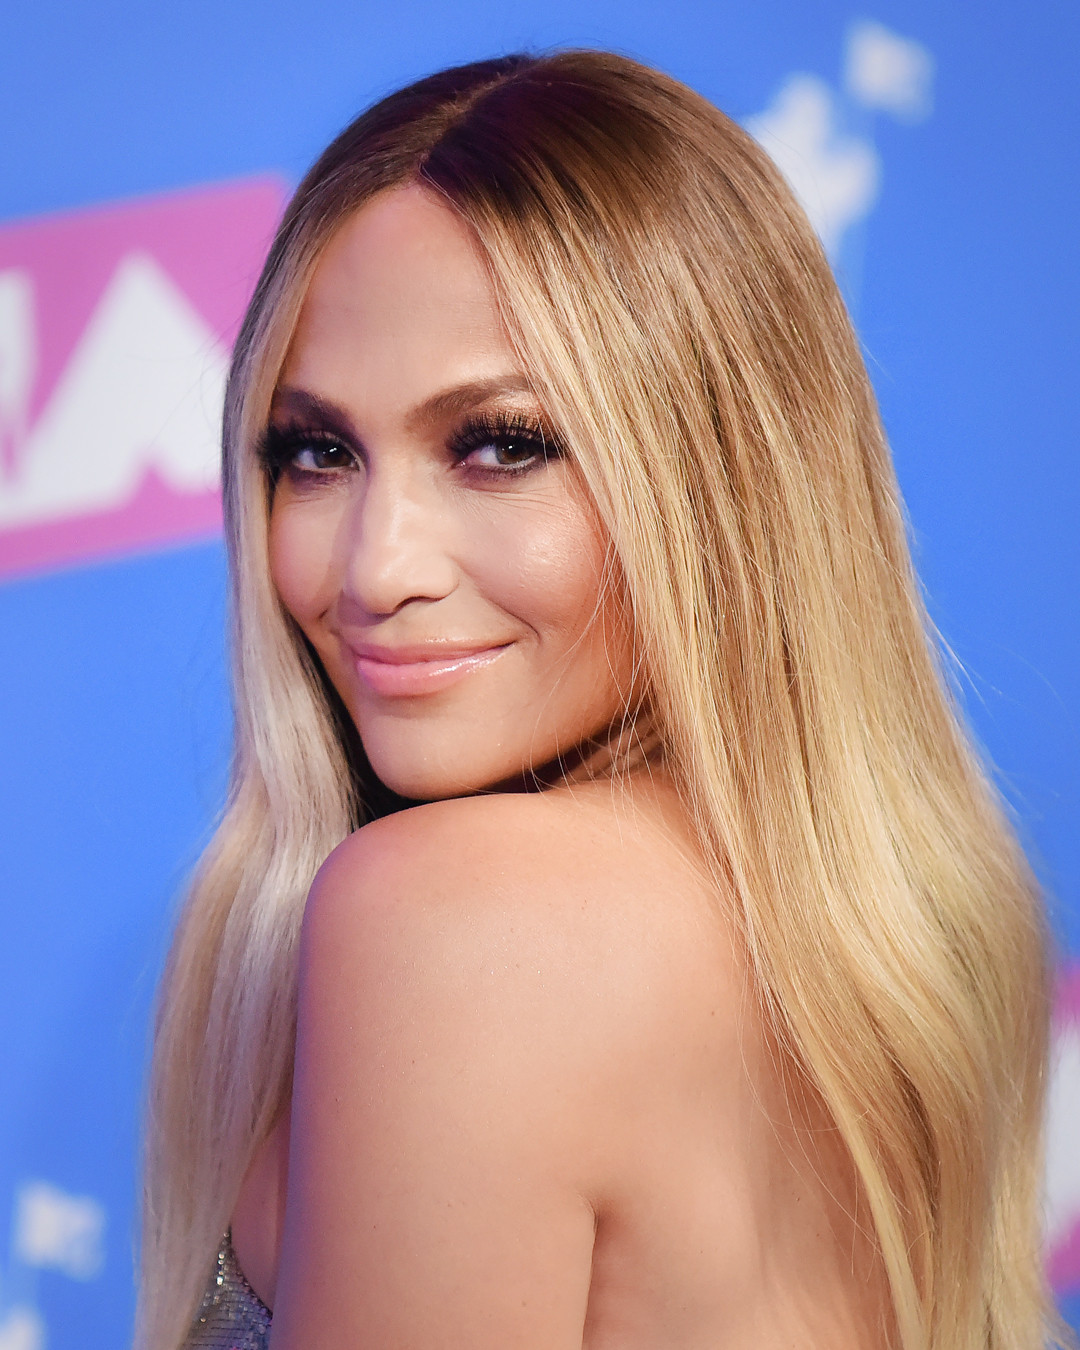 ESC: Jennifer Lopez, MTV Video Music Awards, VMAs, Beauty